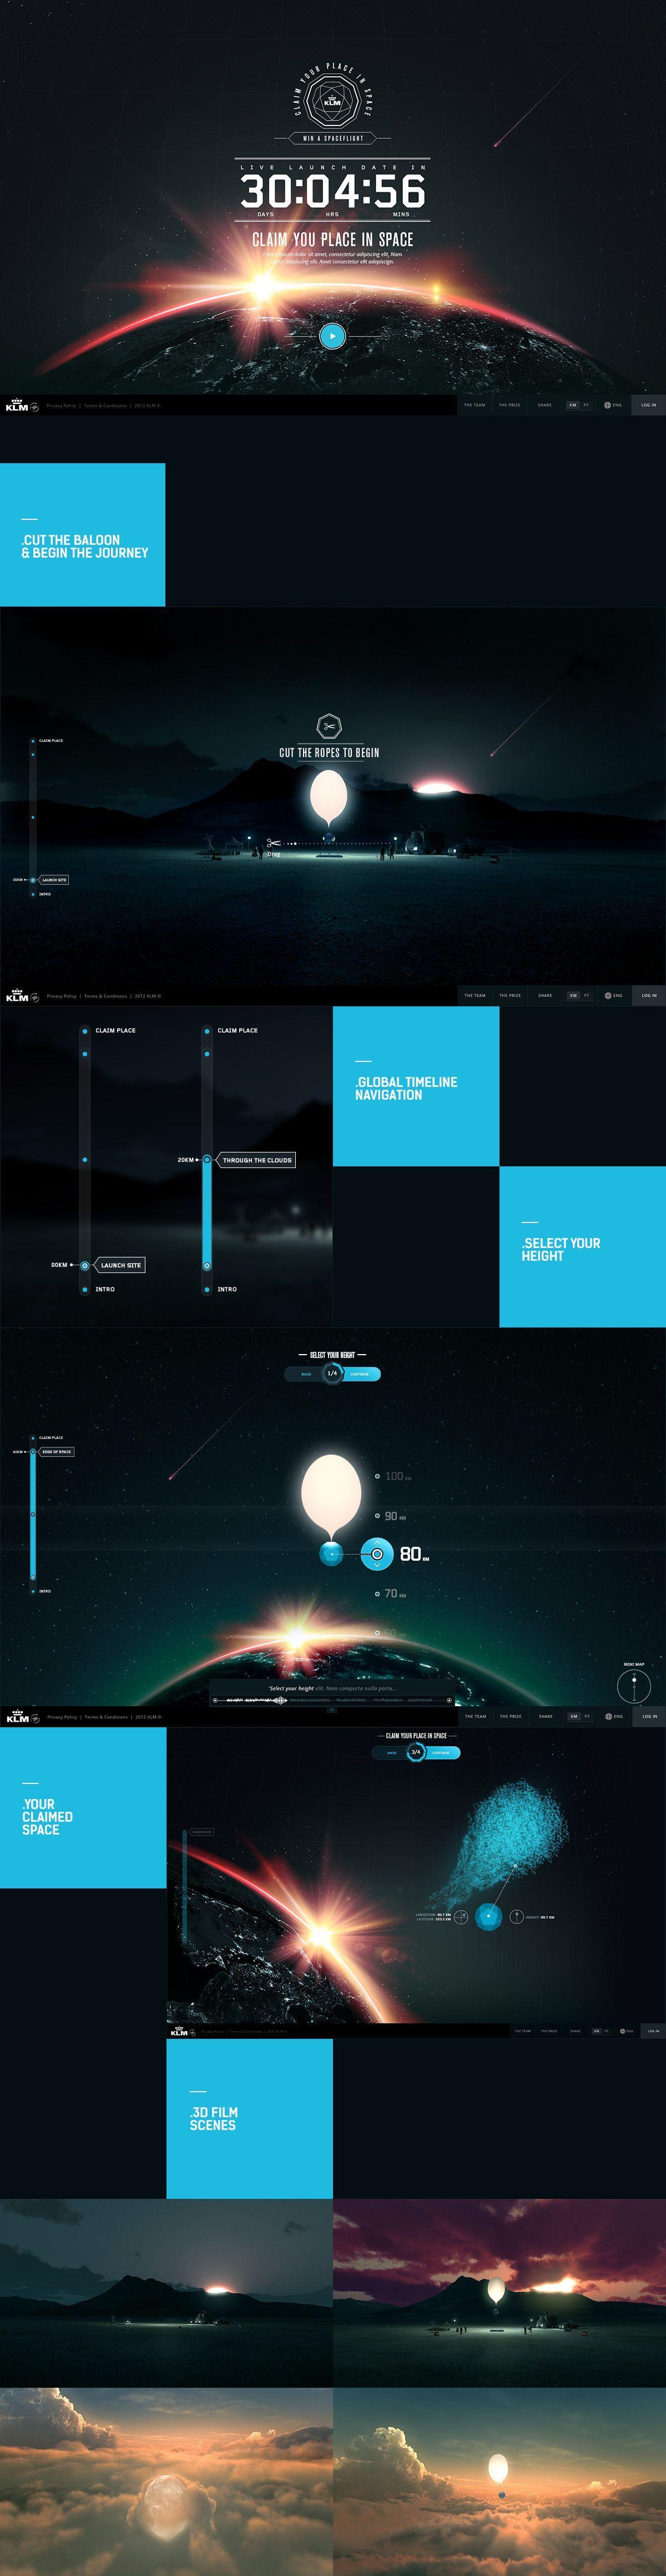 KLM Space -- space, countdown, visual, timeline